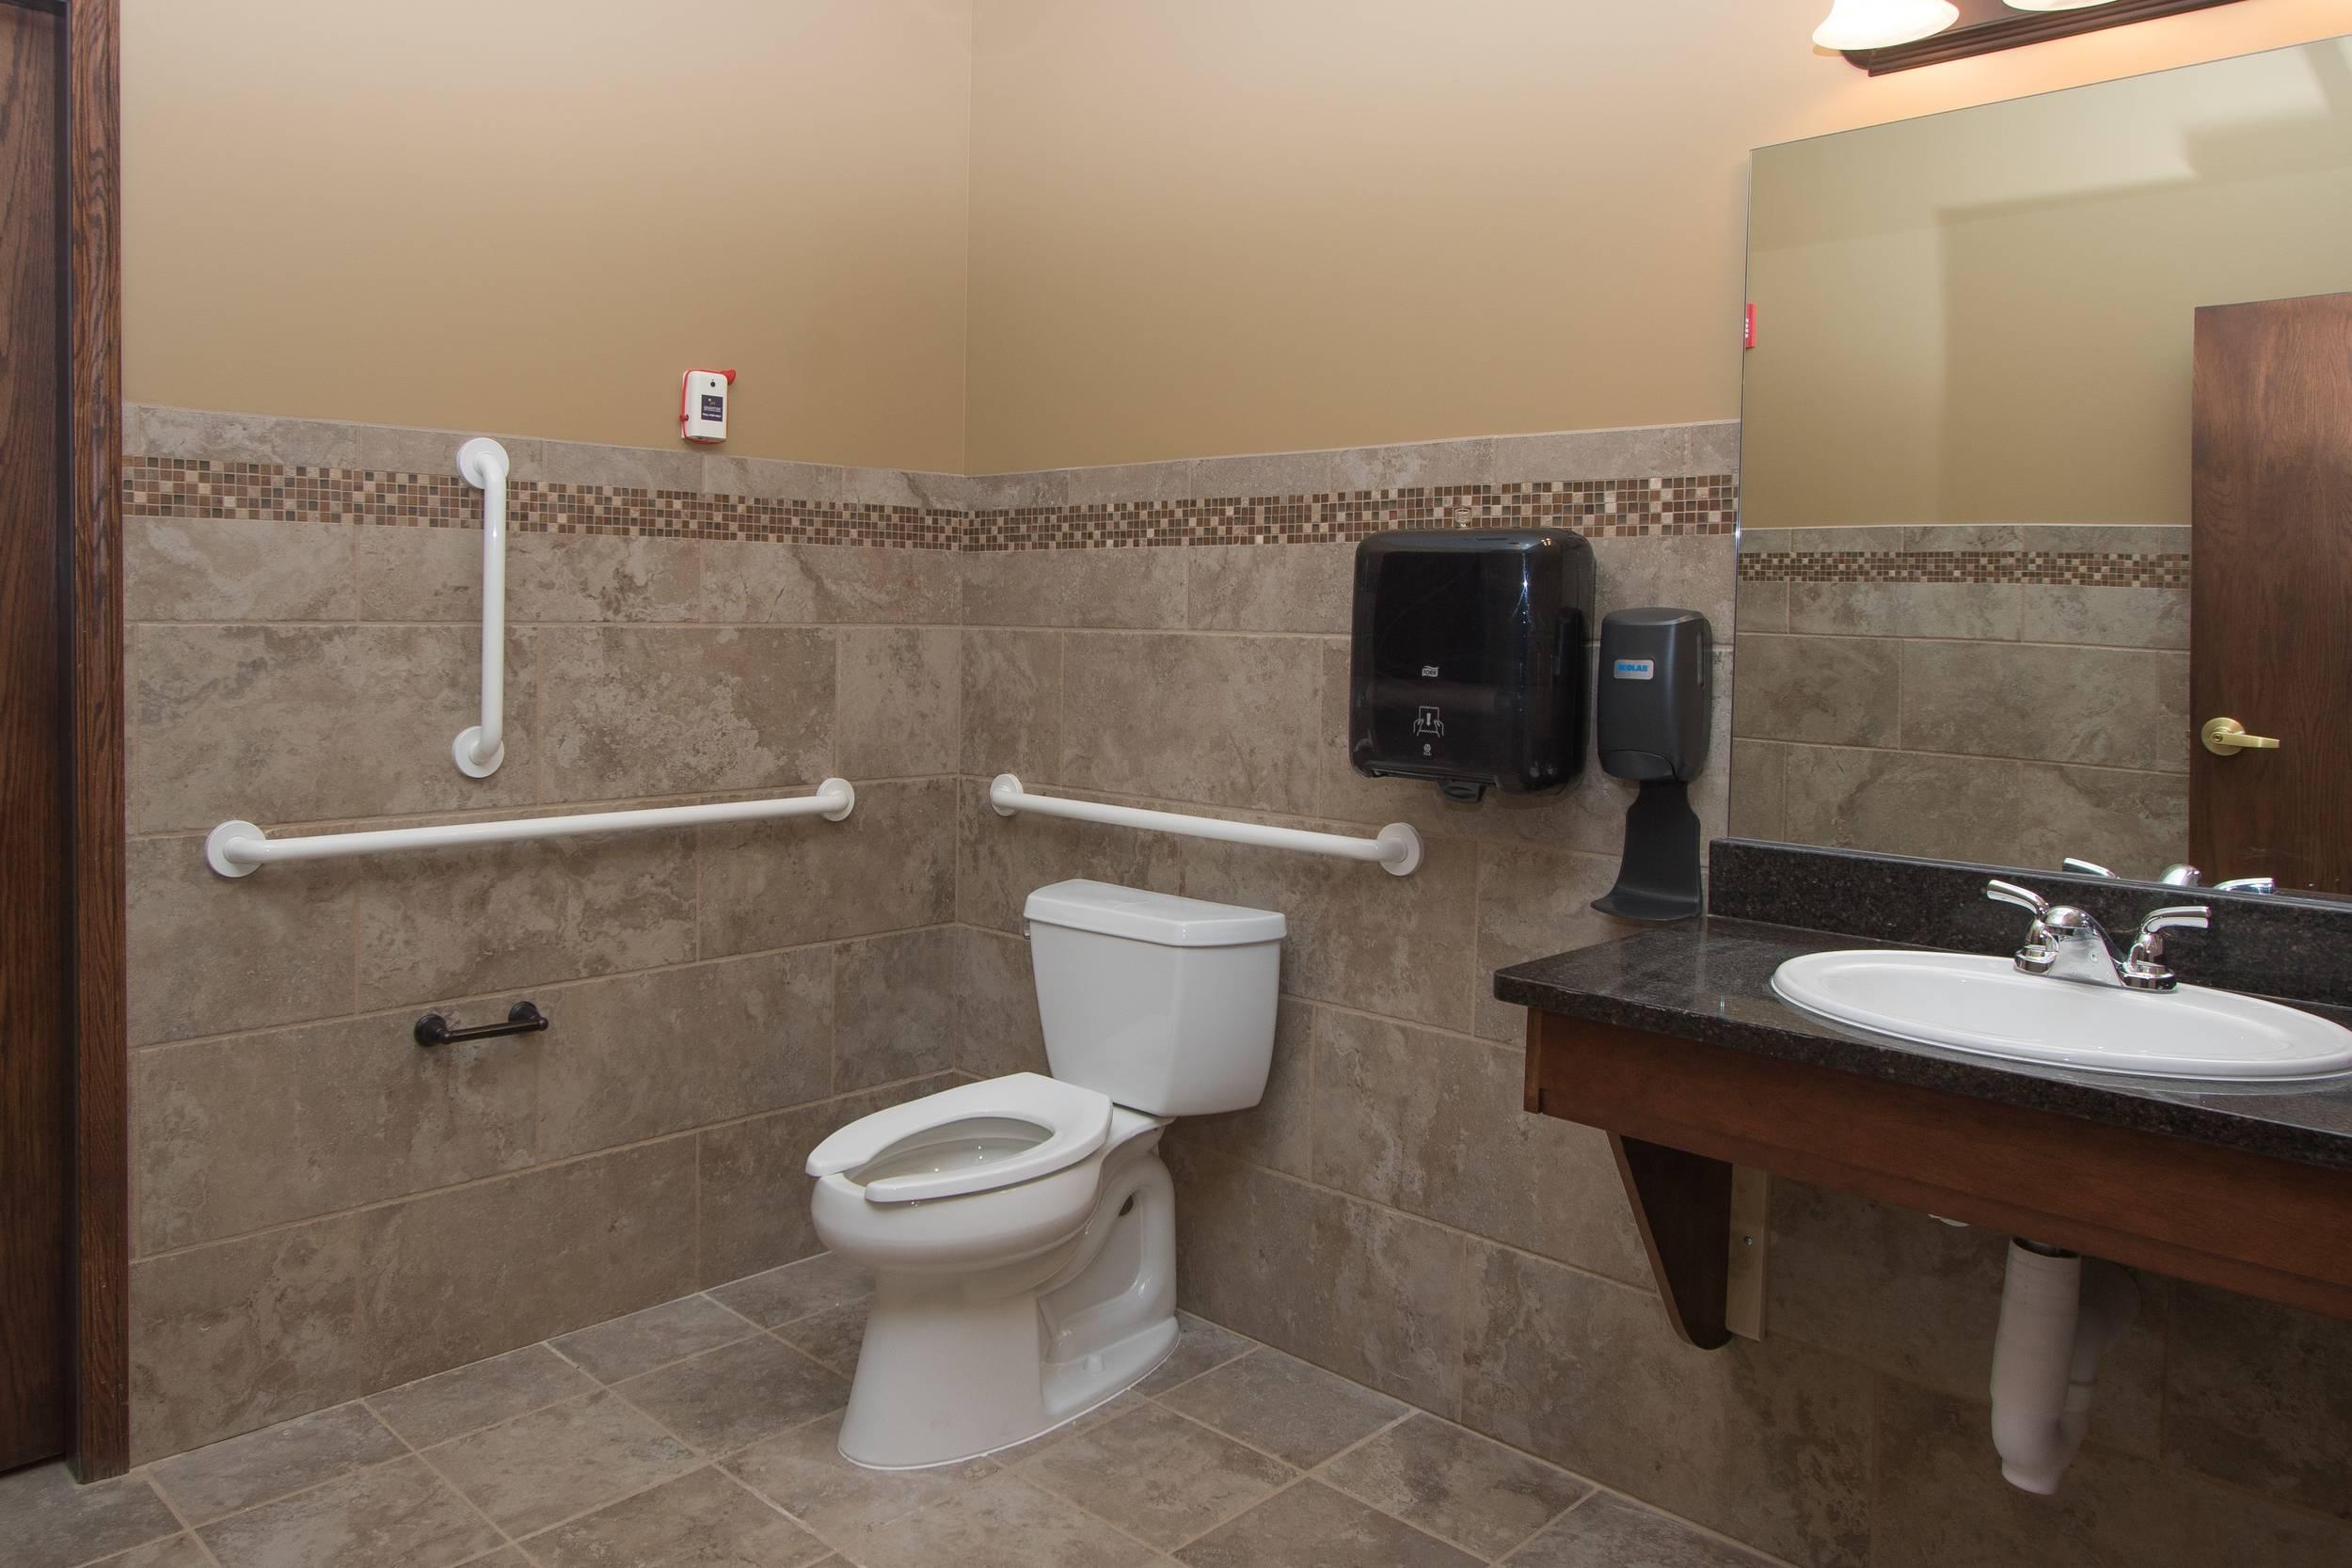 Bickford+Interior_bathroom-min[1].JPG